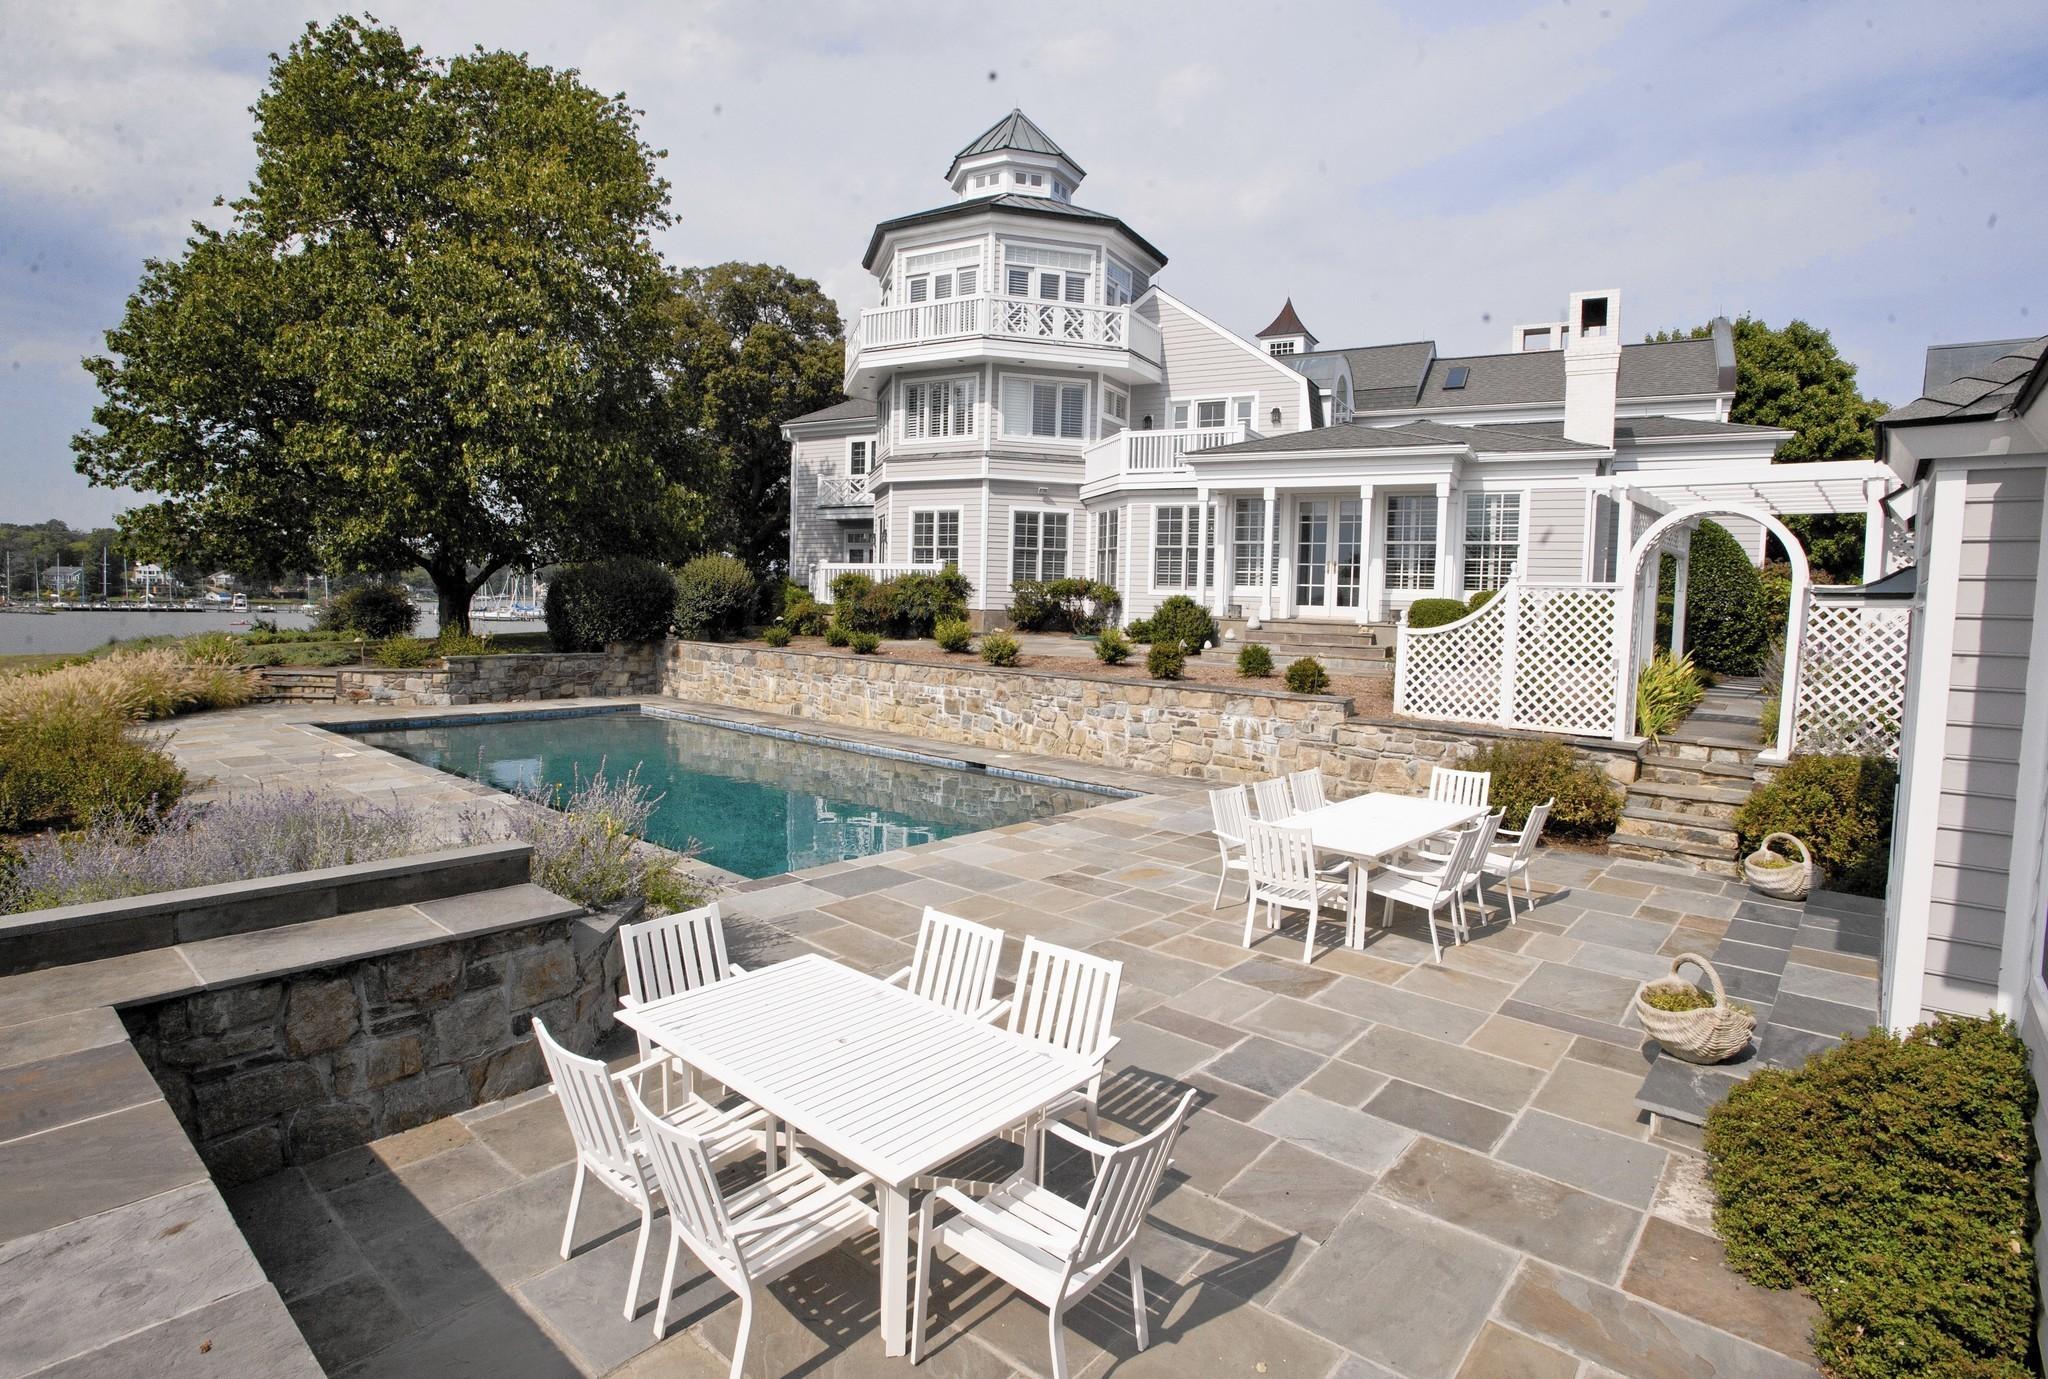 Annapolis Home Originally Listed For $8.9M To Go Up For